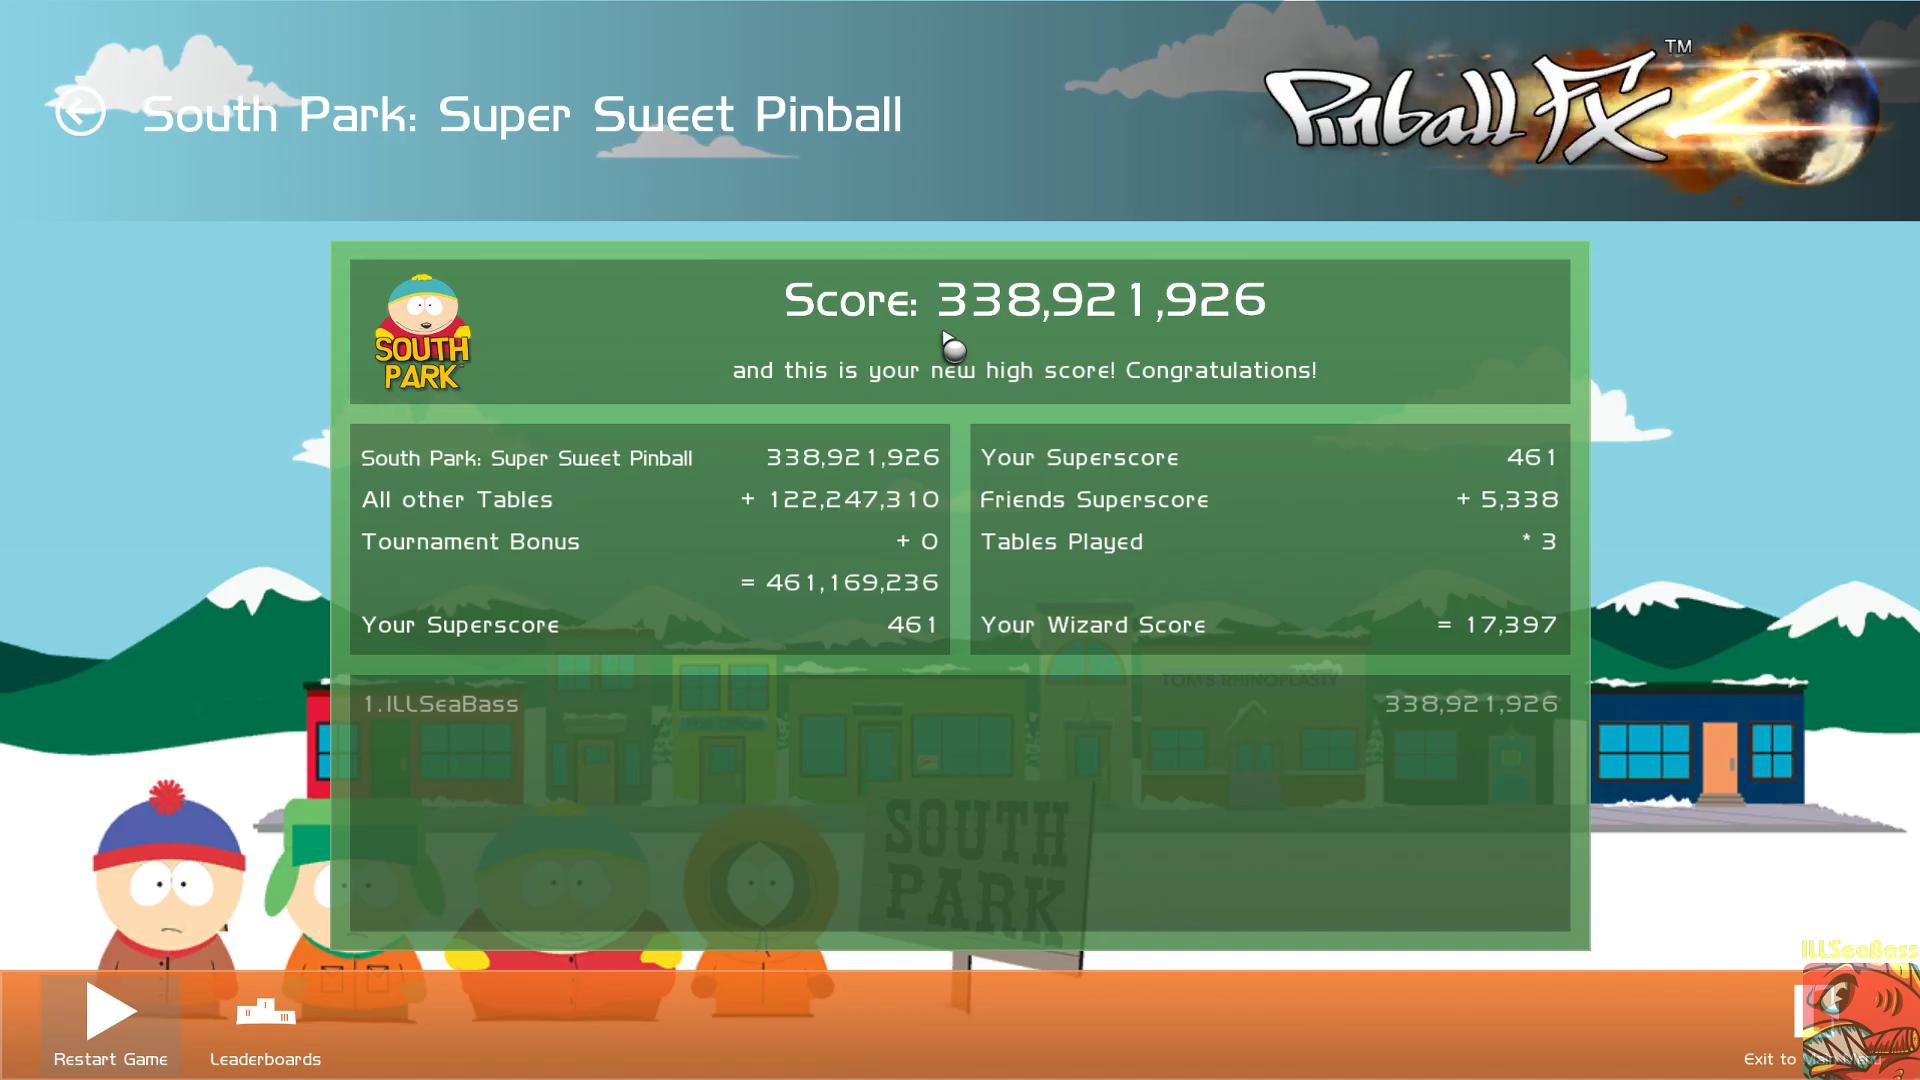 ILLSeaBass: Pinball FX 2: South Park: Super Sweet Pinball (PC) 338,921,926 points on 2019-06-18 01:37:00